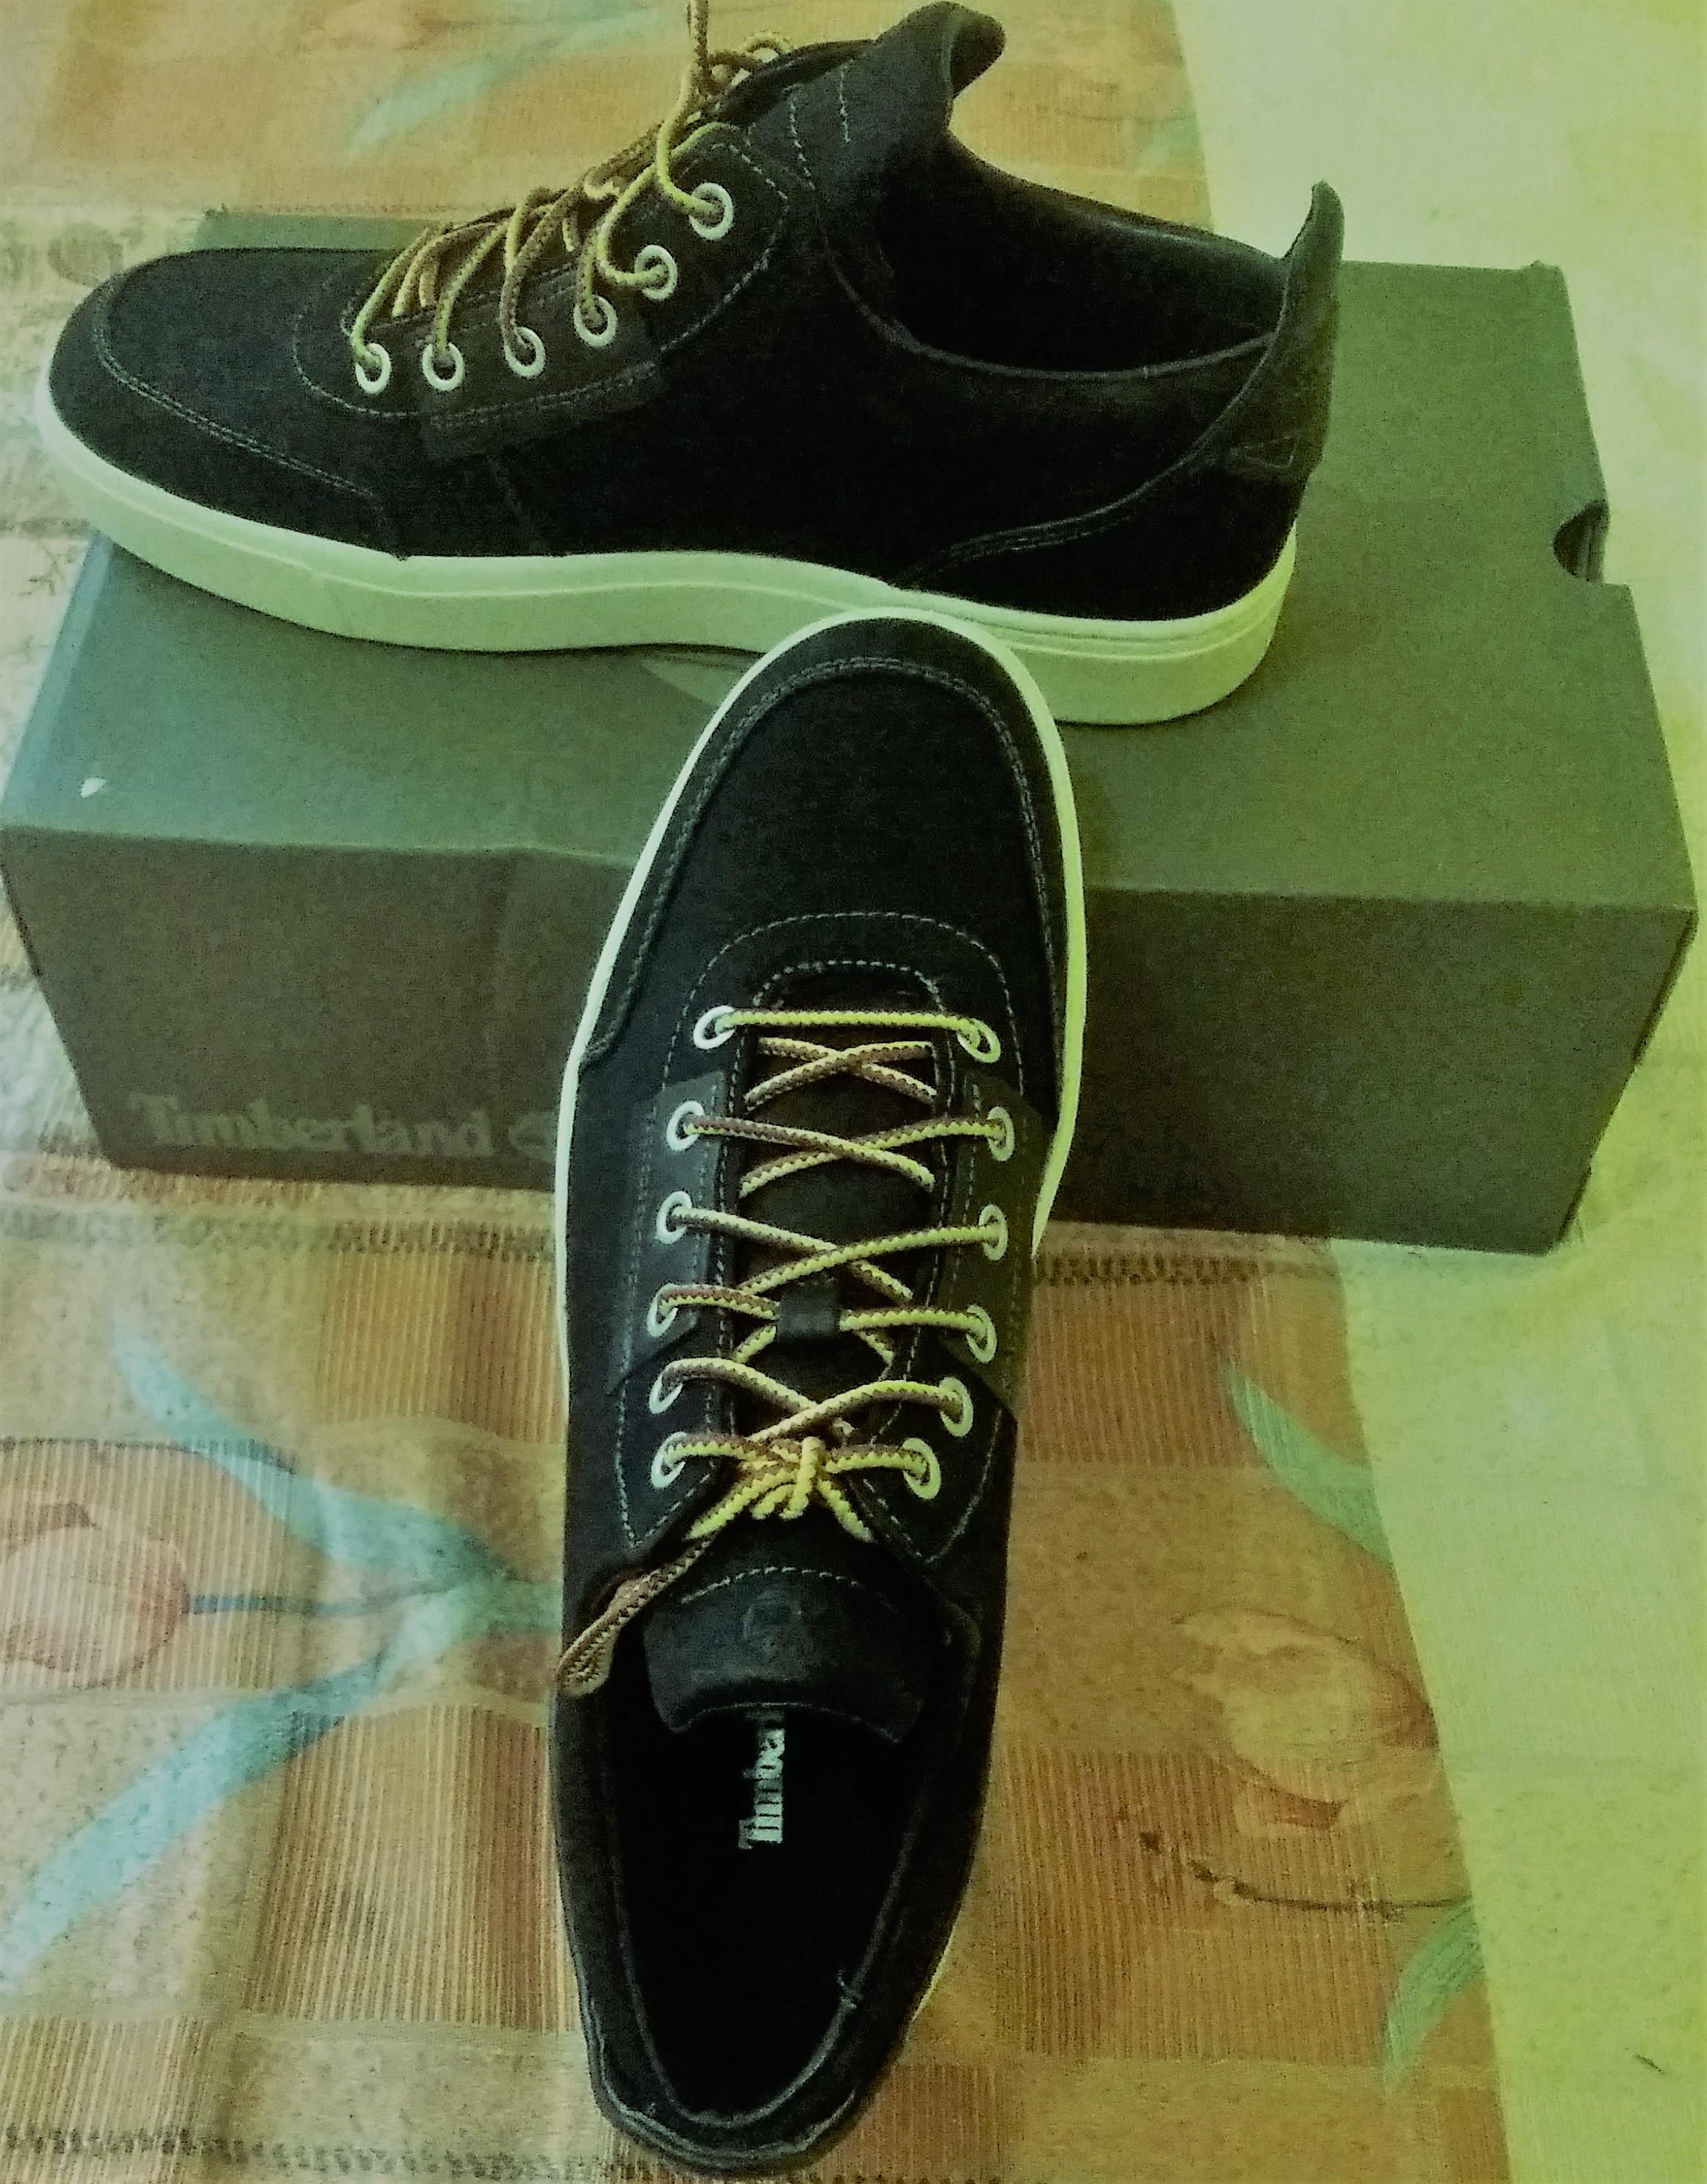 Timberland Men Black Boots – My Preferences | For Kicks sake